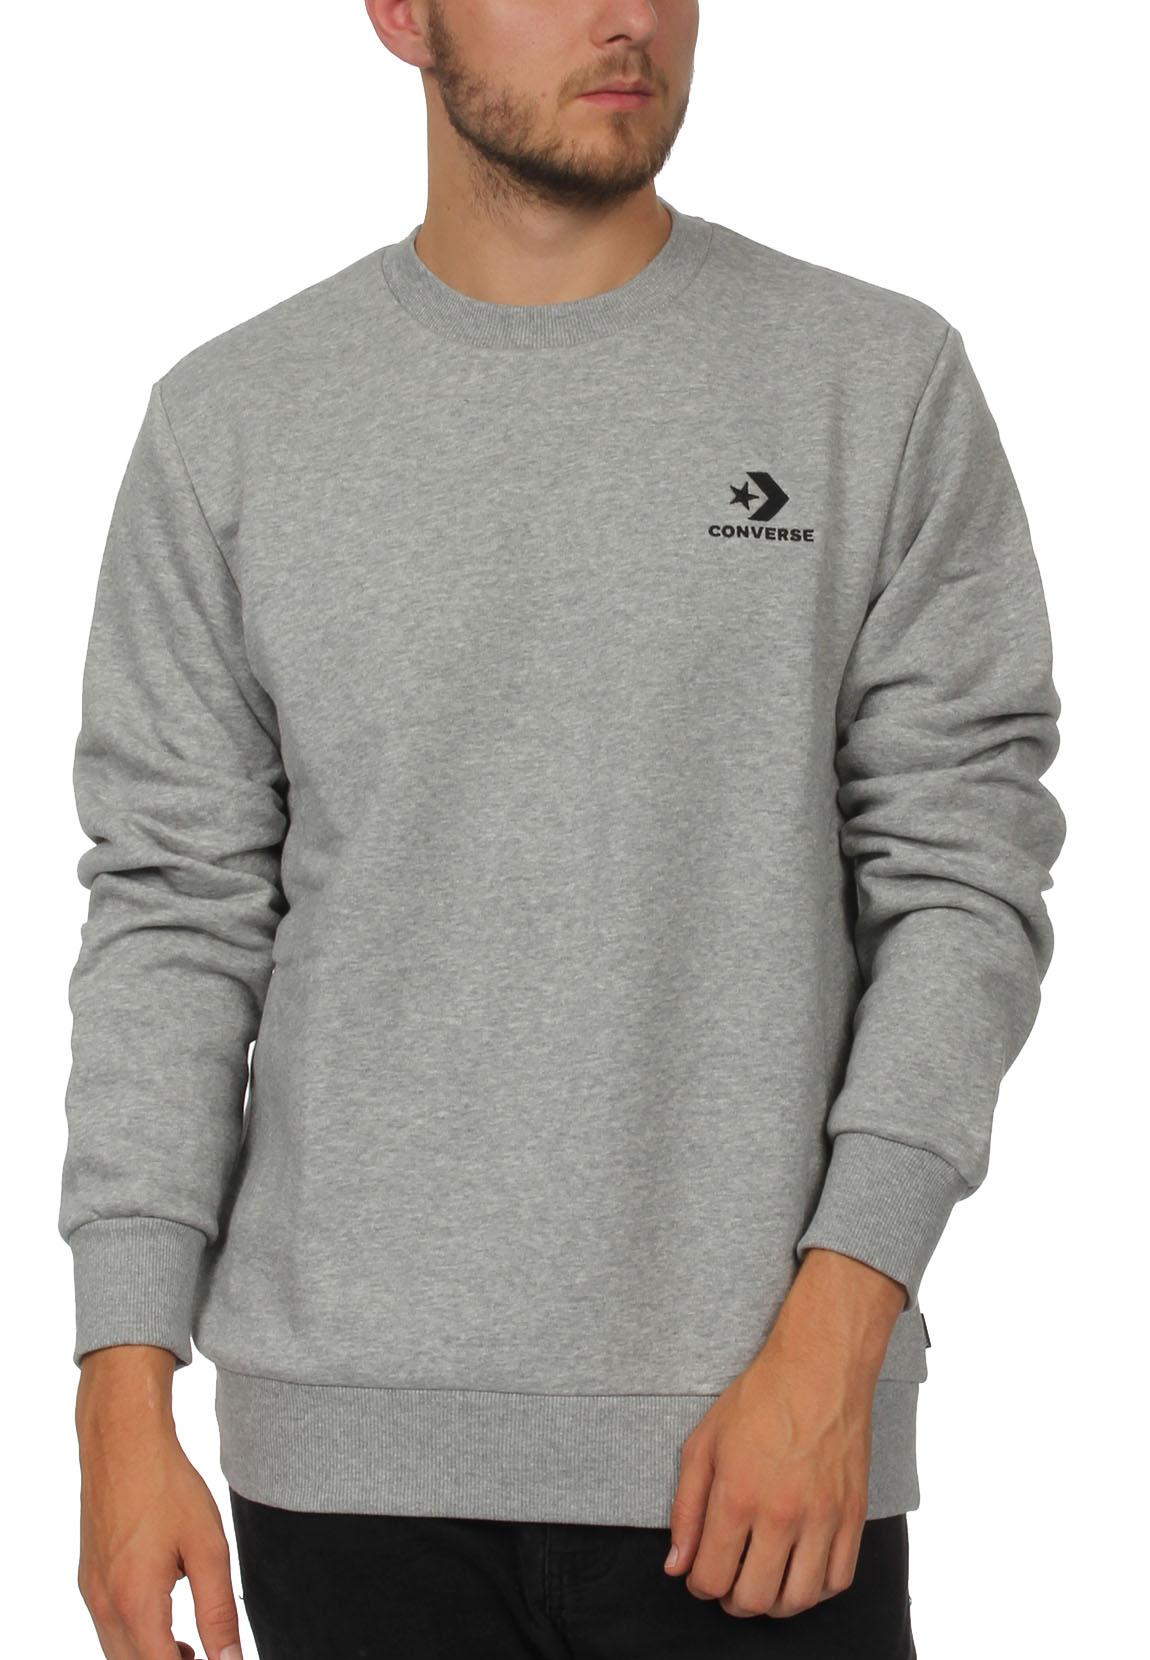 Converse Sweatshirt Herren STAR CHEVRON EMB CREW 10008816 Vintage Grey Heather 035